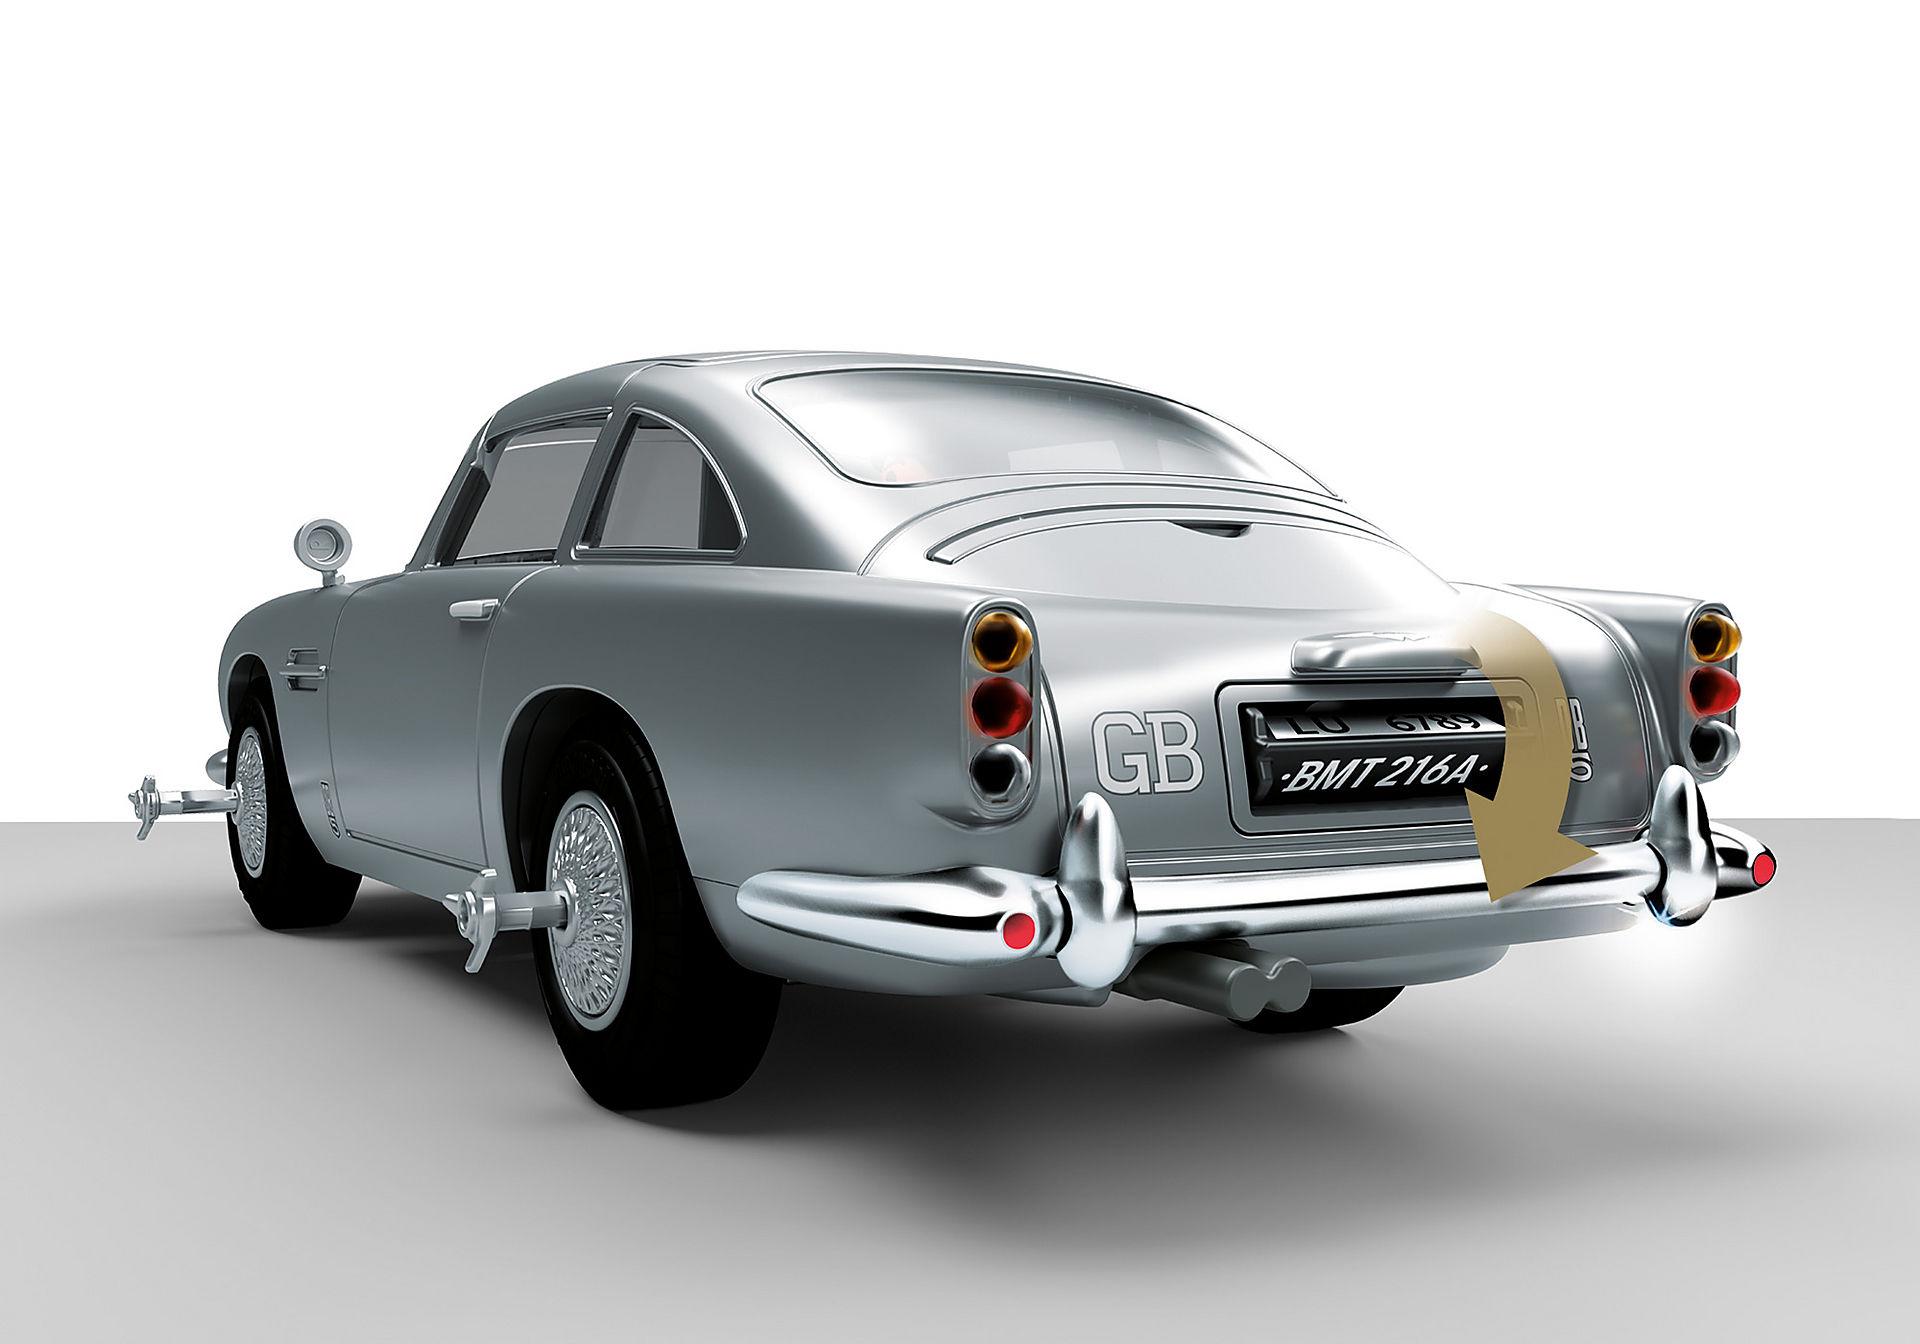 70578 James Bond Aston Martin DB5 - Goldfinger Edition zoom image11